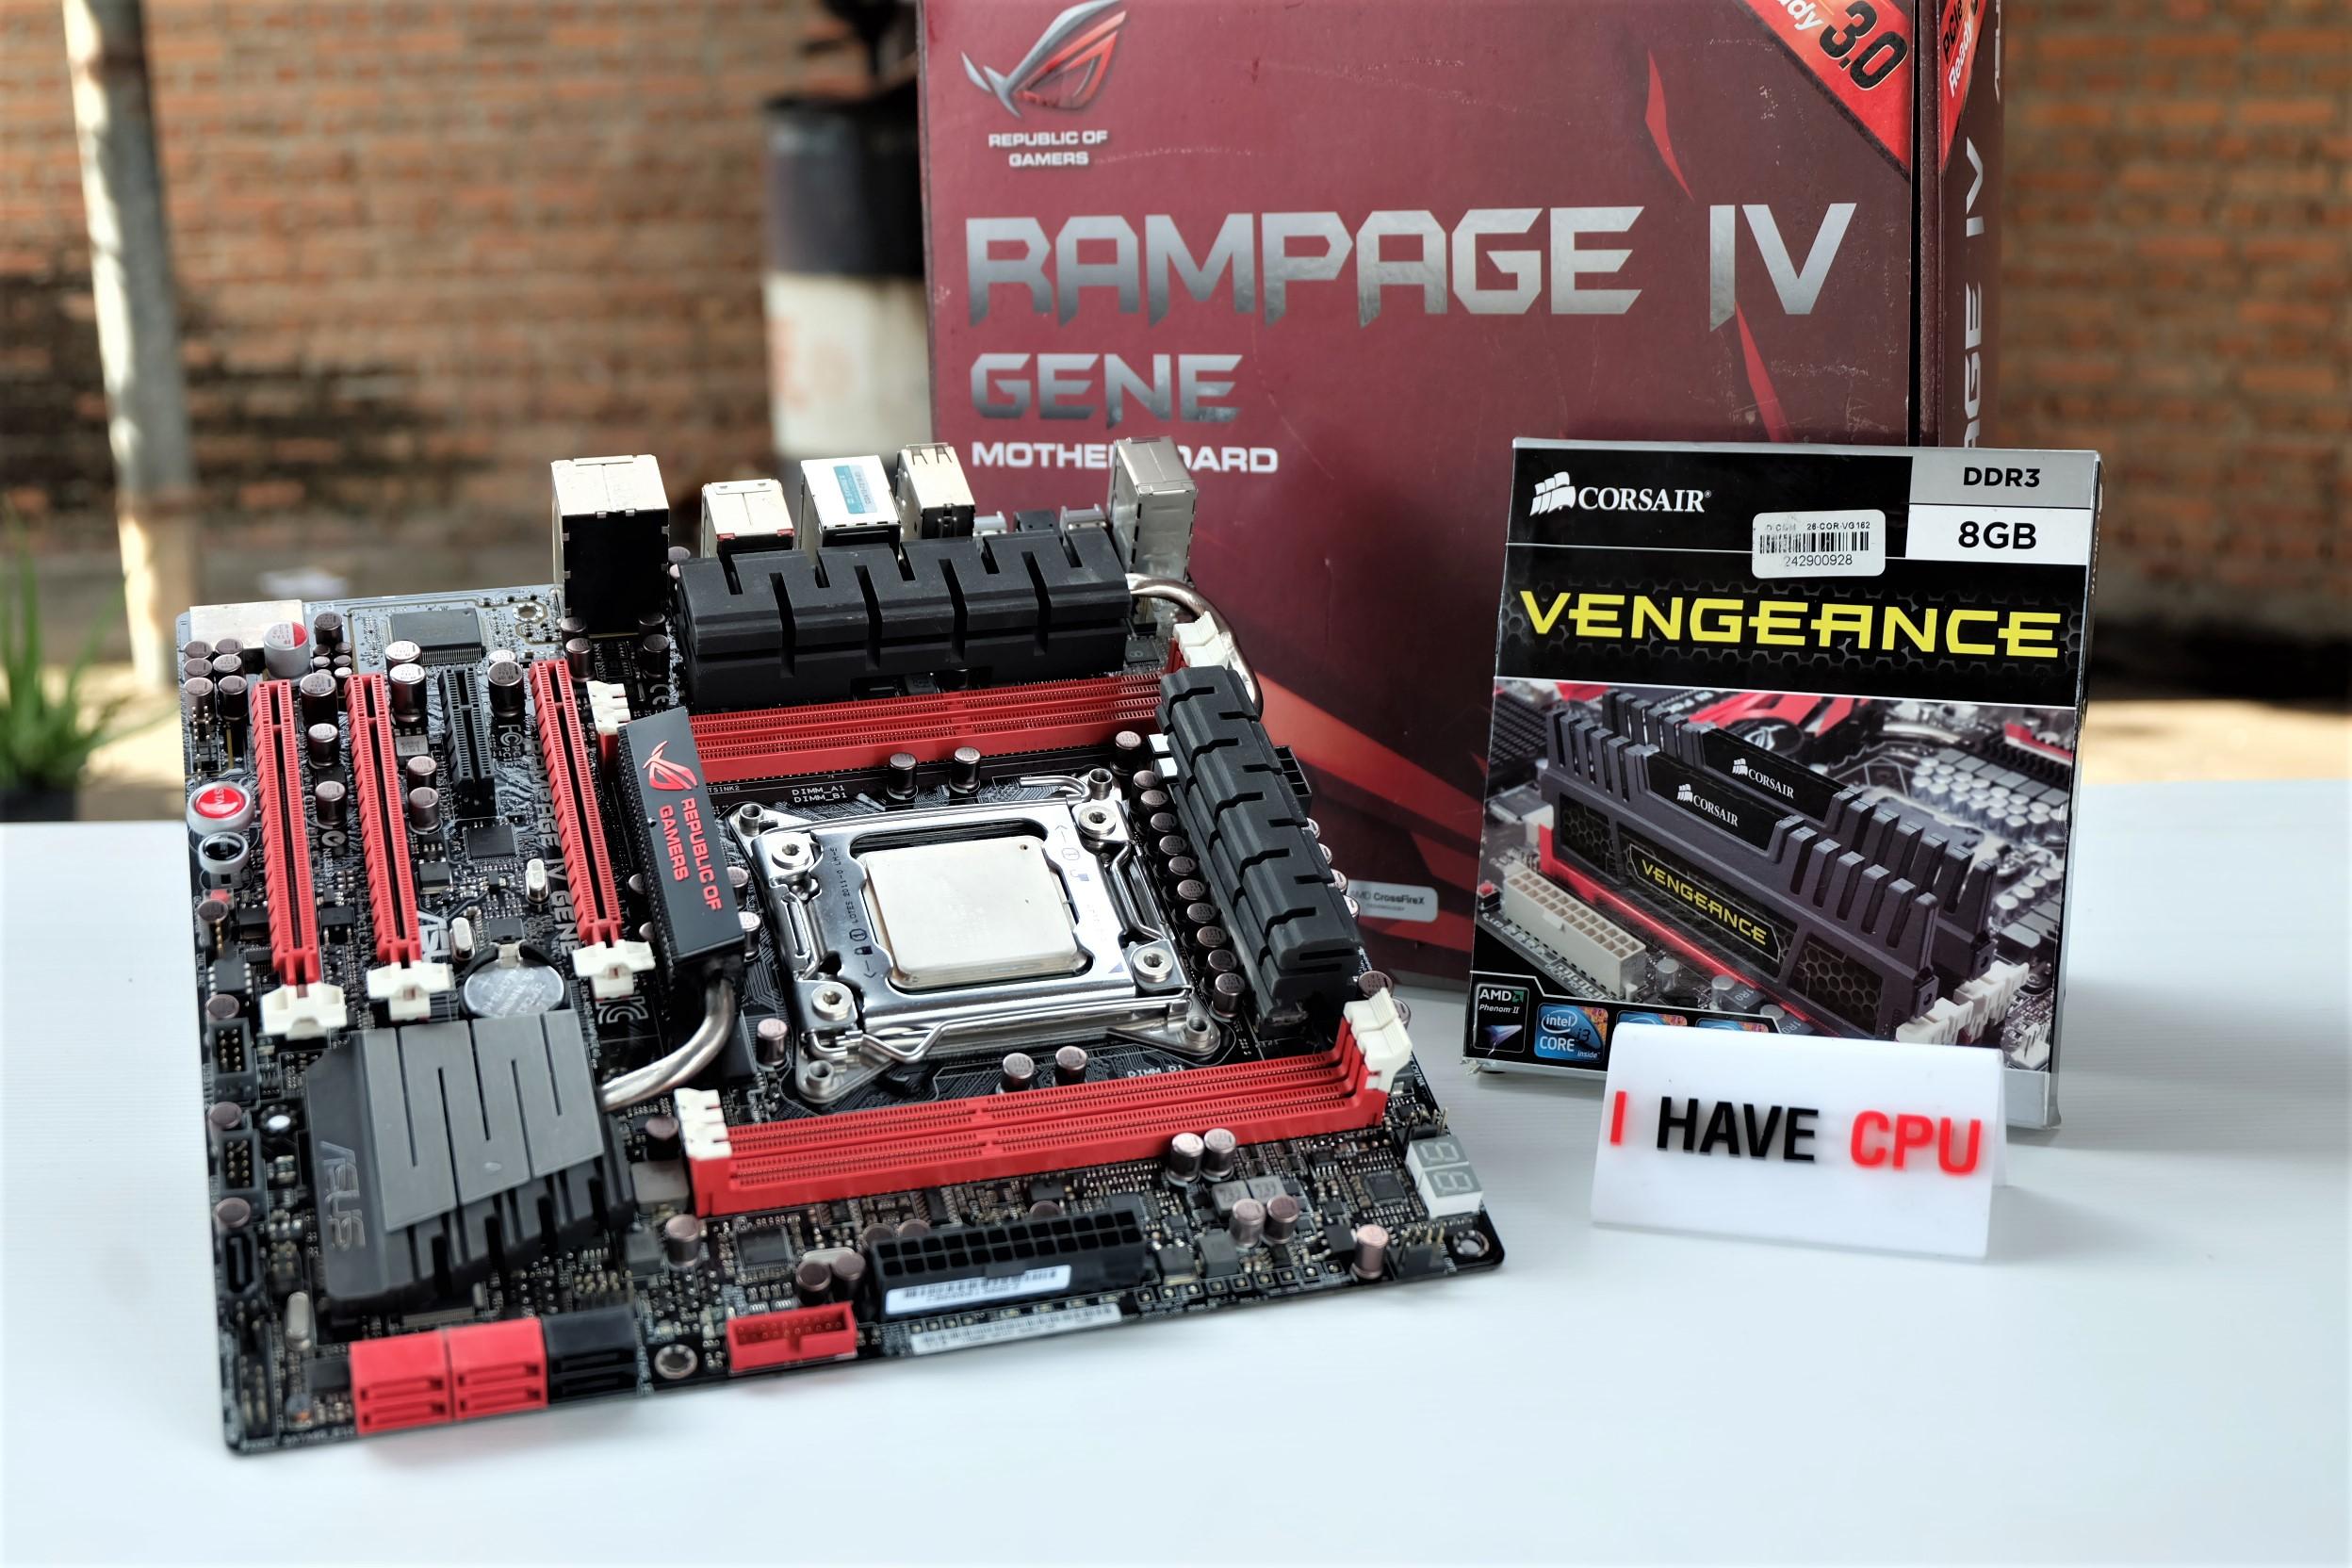 i7-3960X 3.9Ghz 6C 12T / RAMPAEG IV GENE / 16GB CORSAIR VENGEANCE 1600MHZ (4*4)